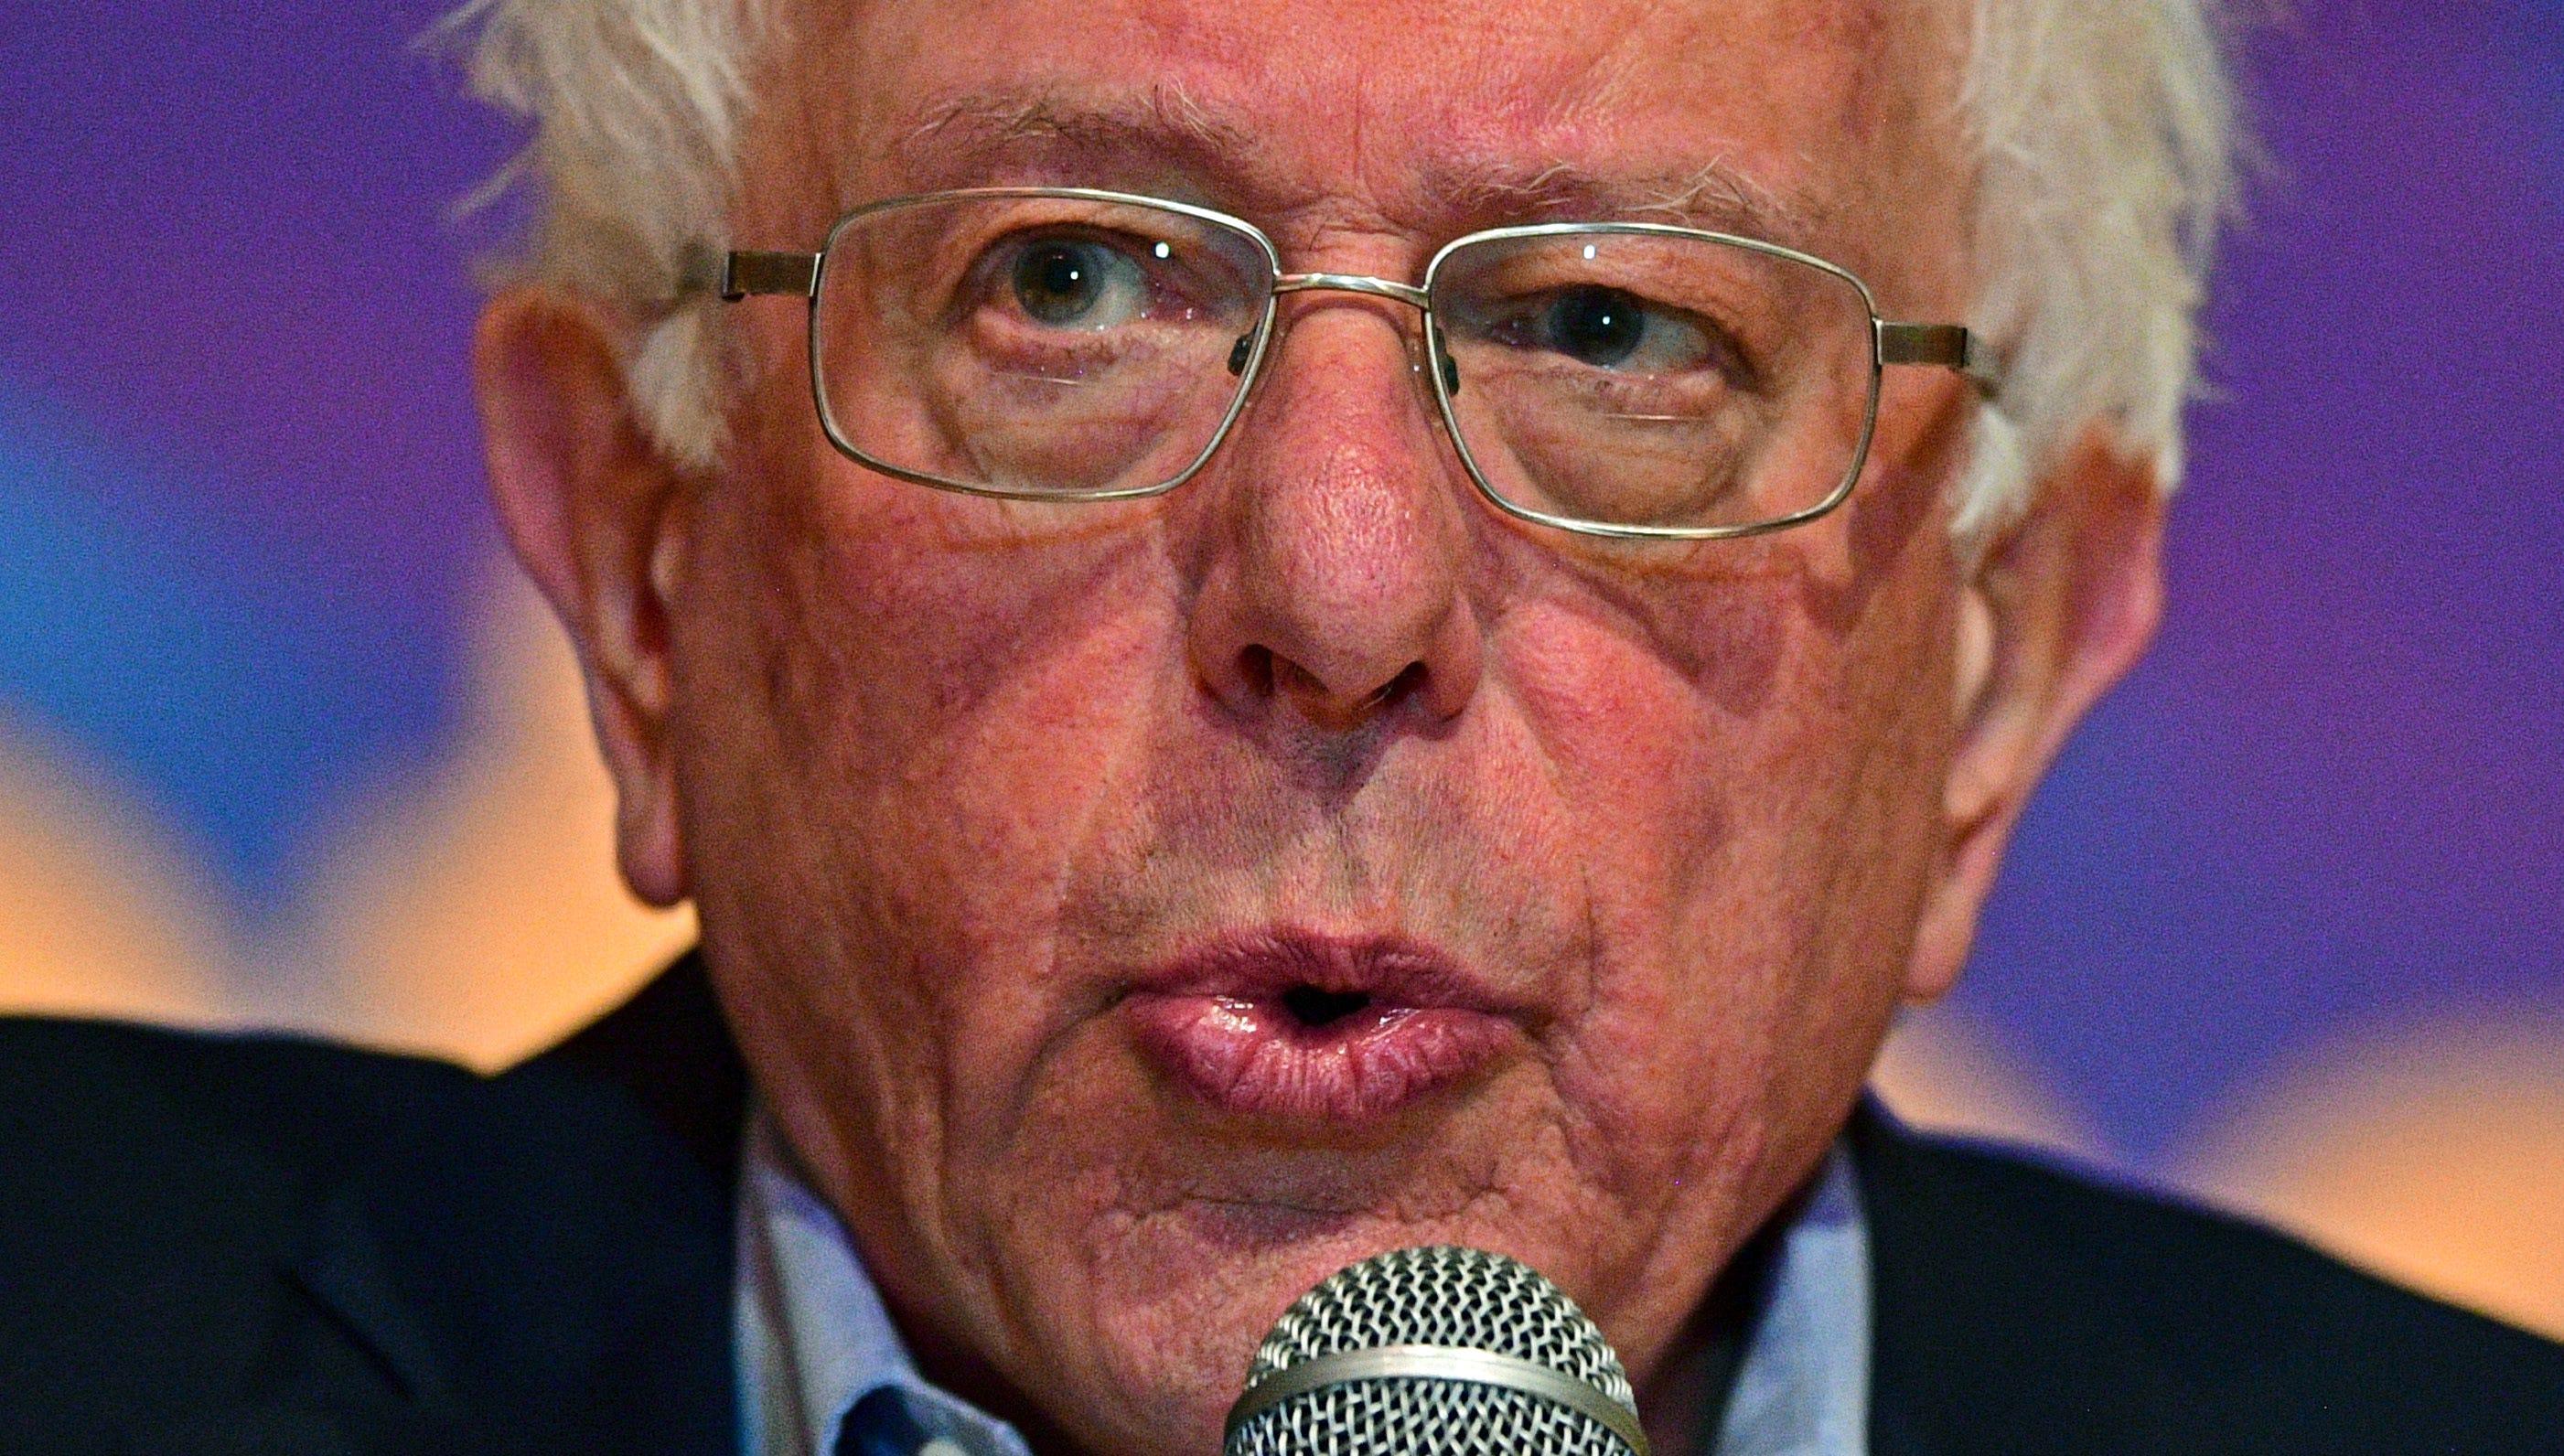 Sen. Bernie Sanders, I-Vt., speaks at an Ohio workers town hall meeting, Sunday, April 14, 2019, in Warren, Ohio.